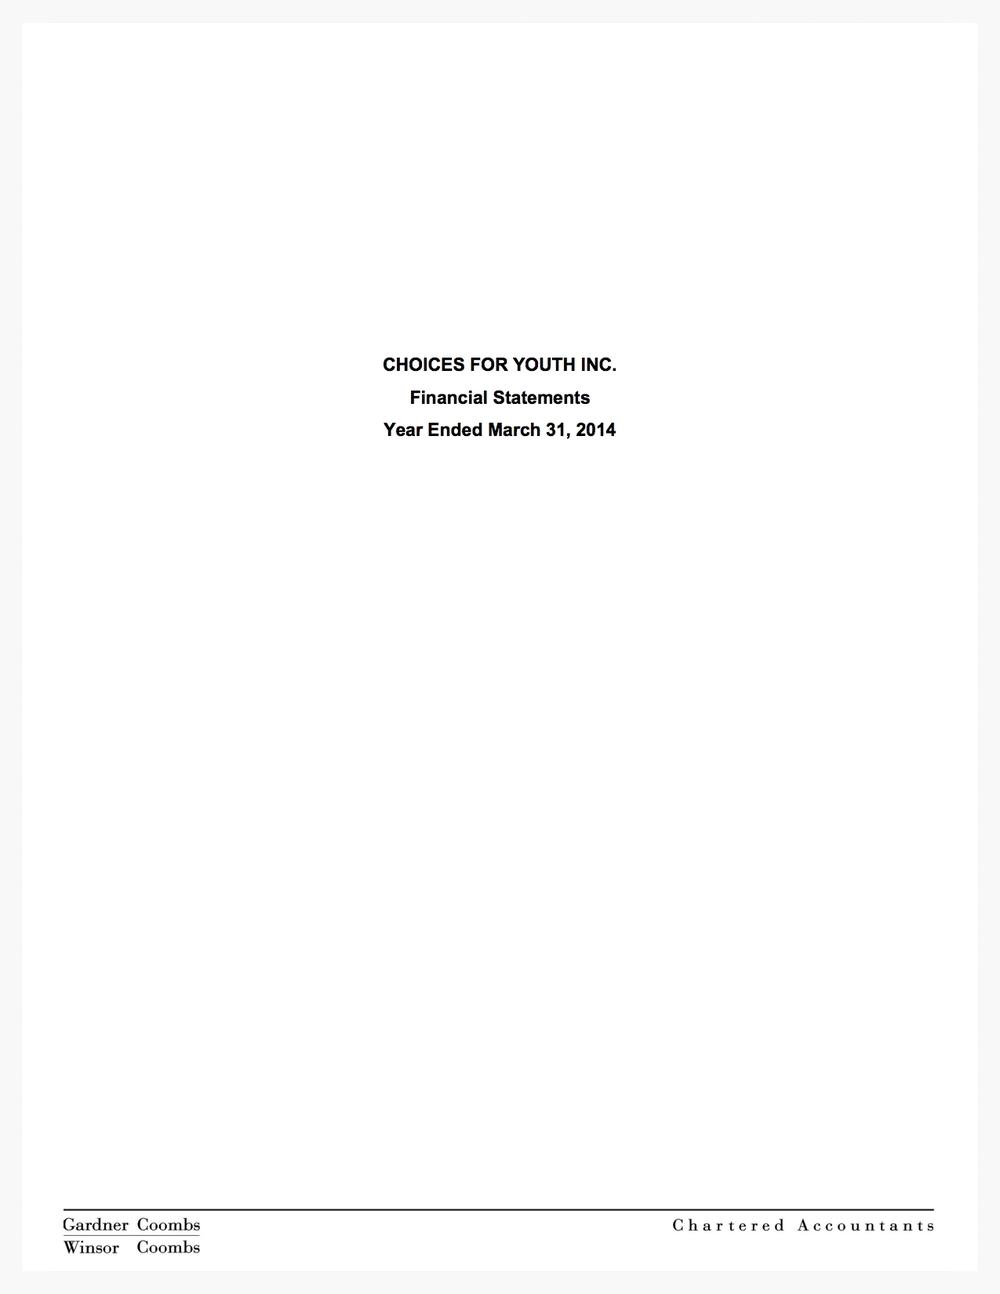 Audited Financials 2013/14